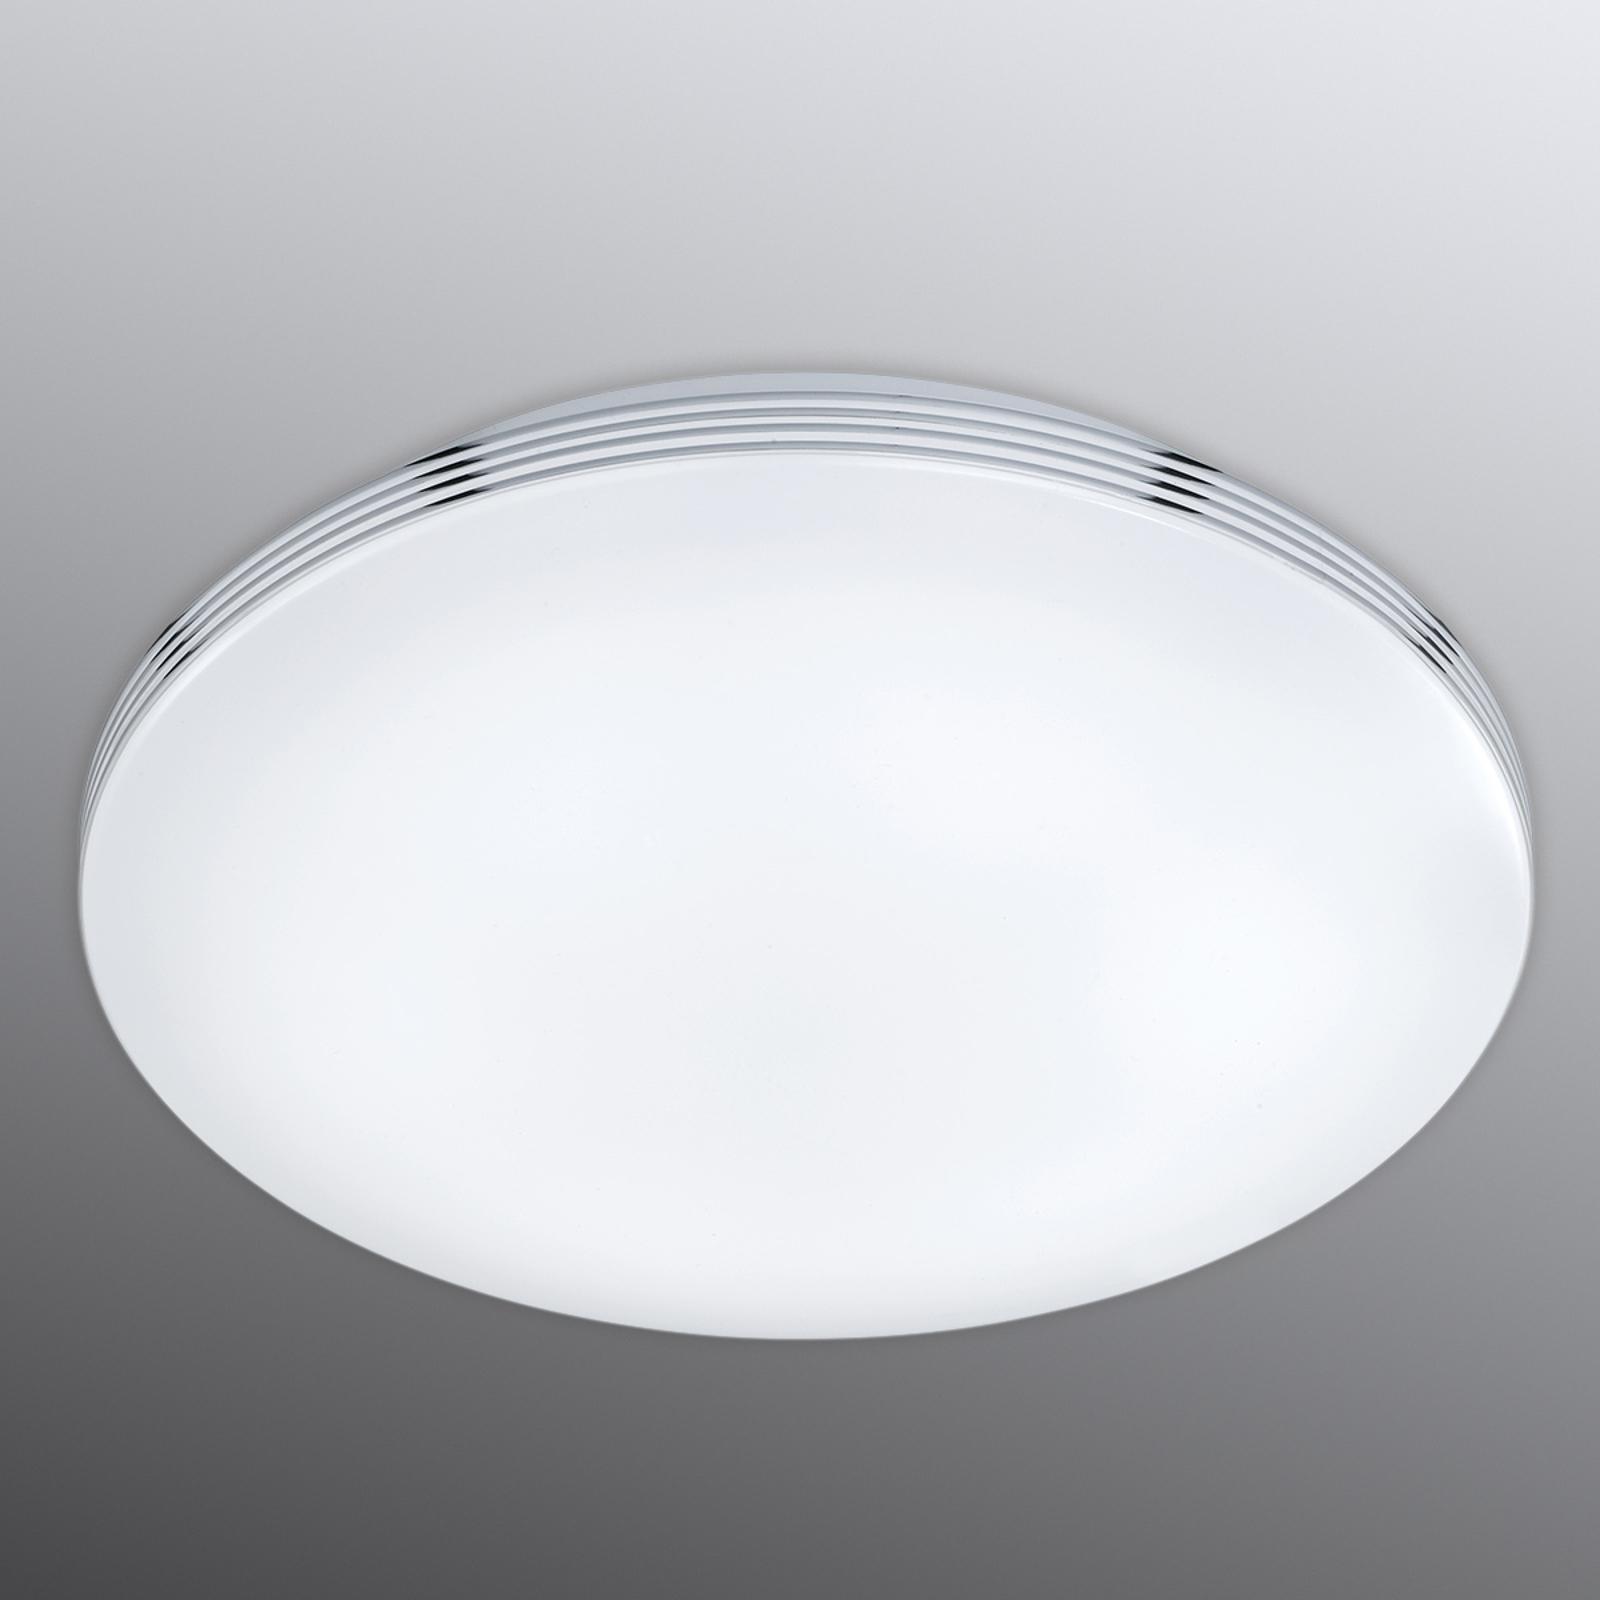 Dimbare LED badkamer plafondlamp Apart